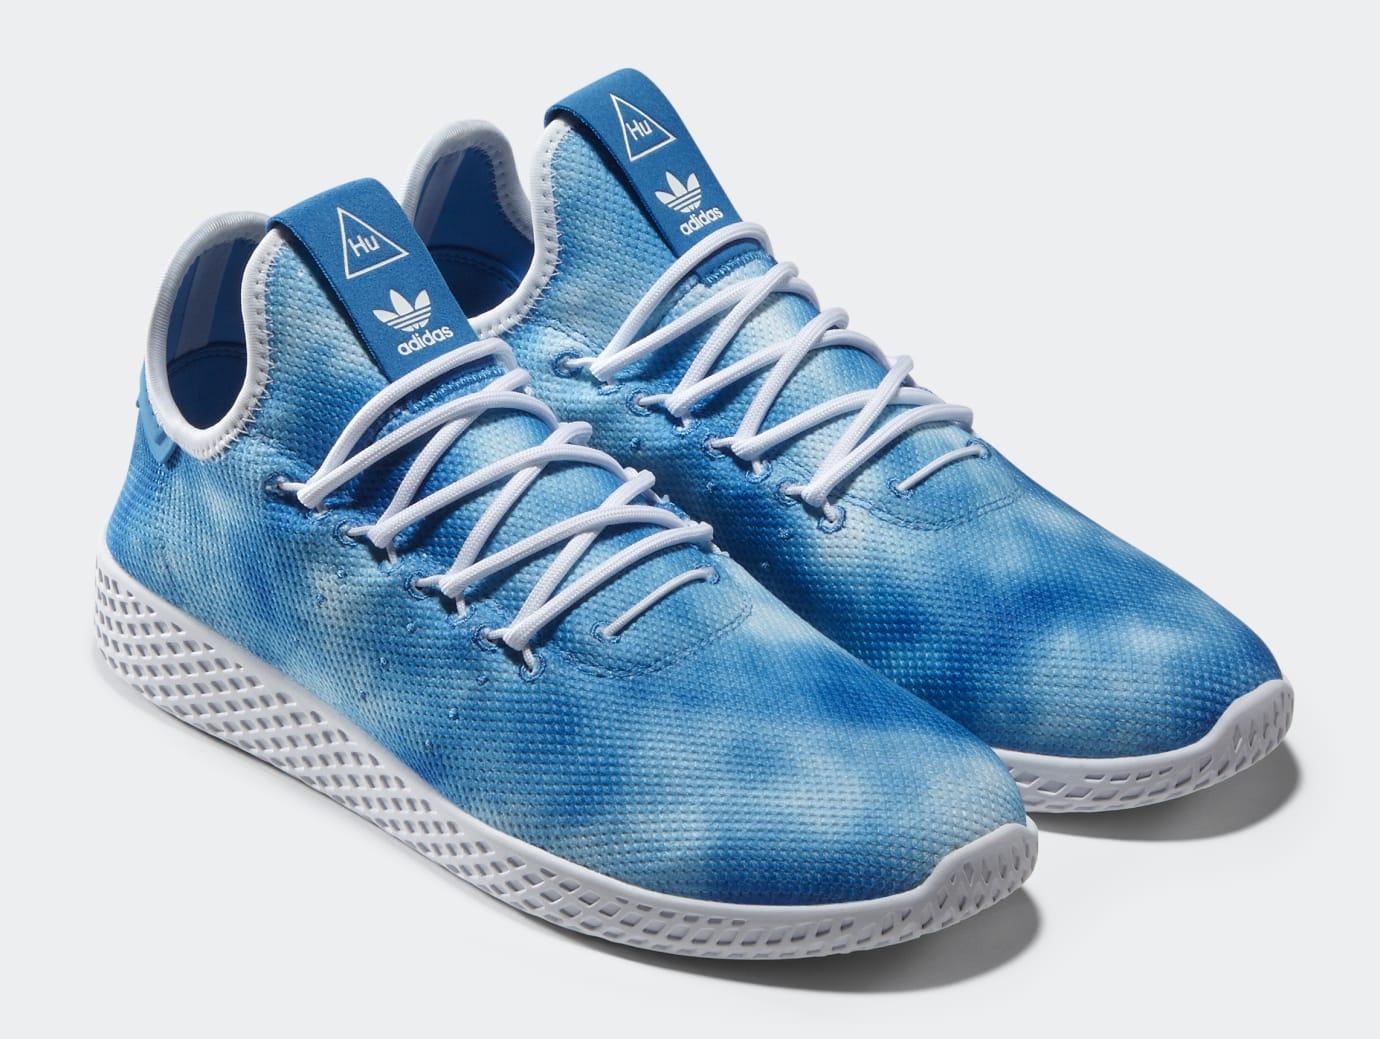 Pharrell x Adidas Tennis HU 'Holi' DA9618 (Pair)